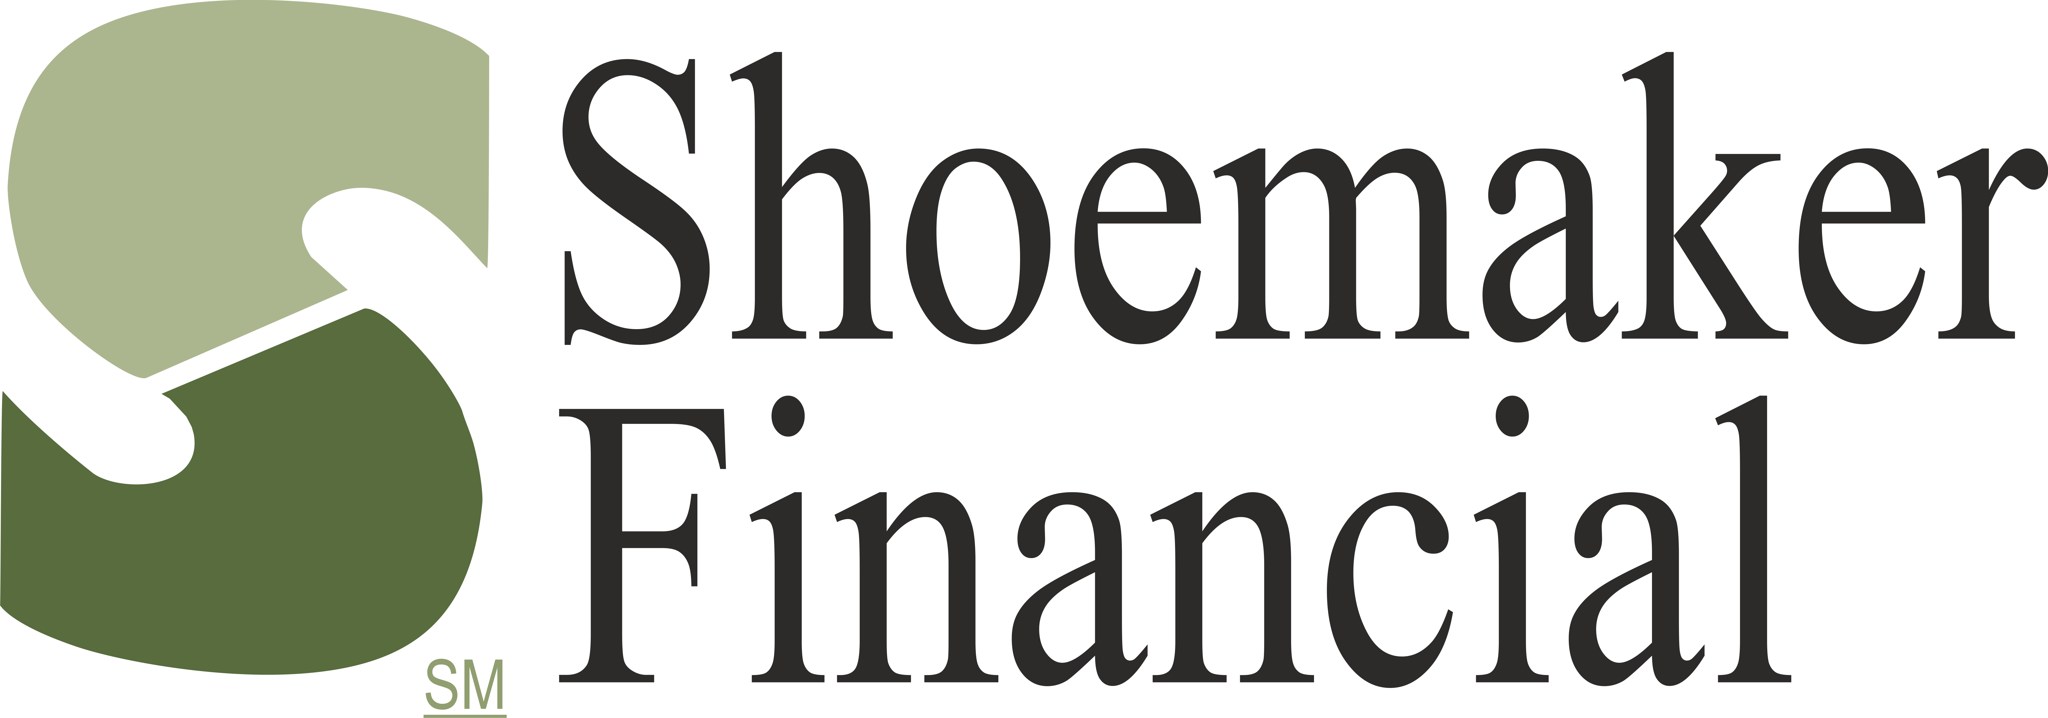 Shoemaker Financial